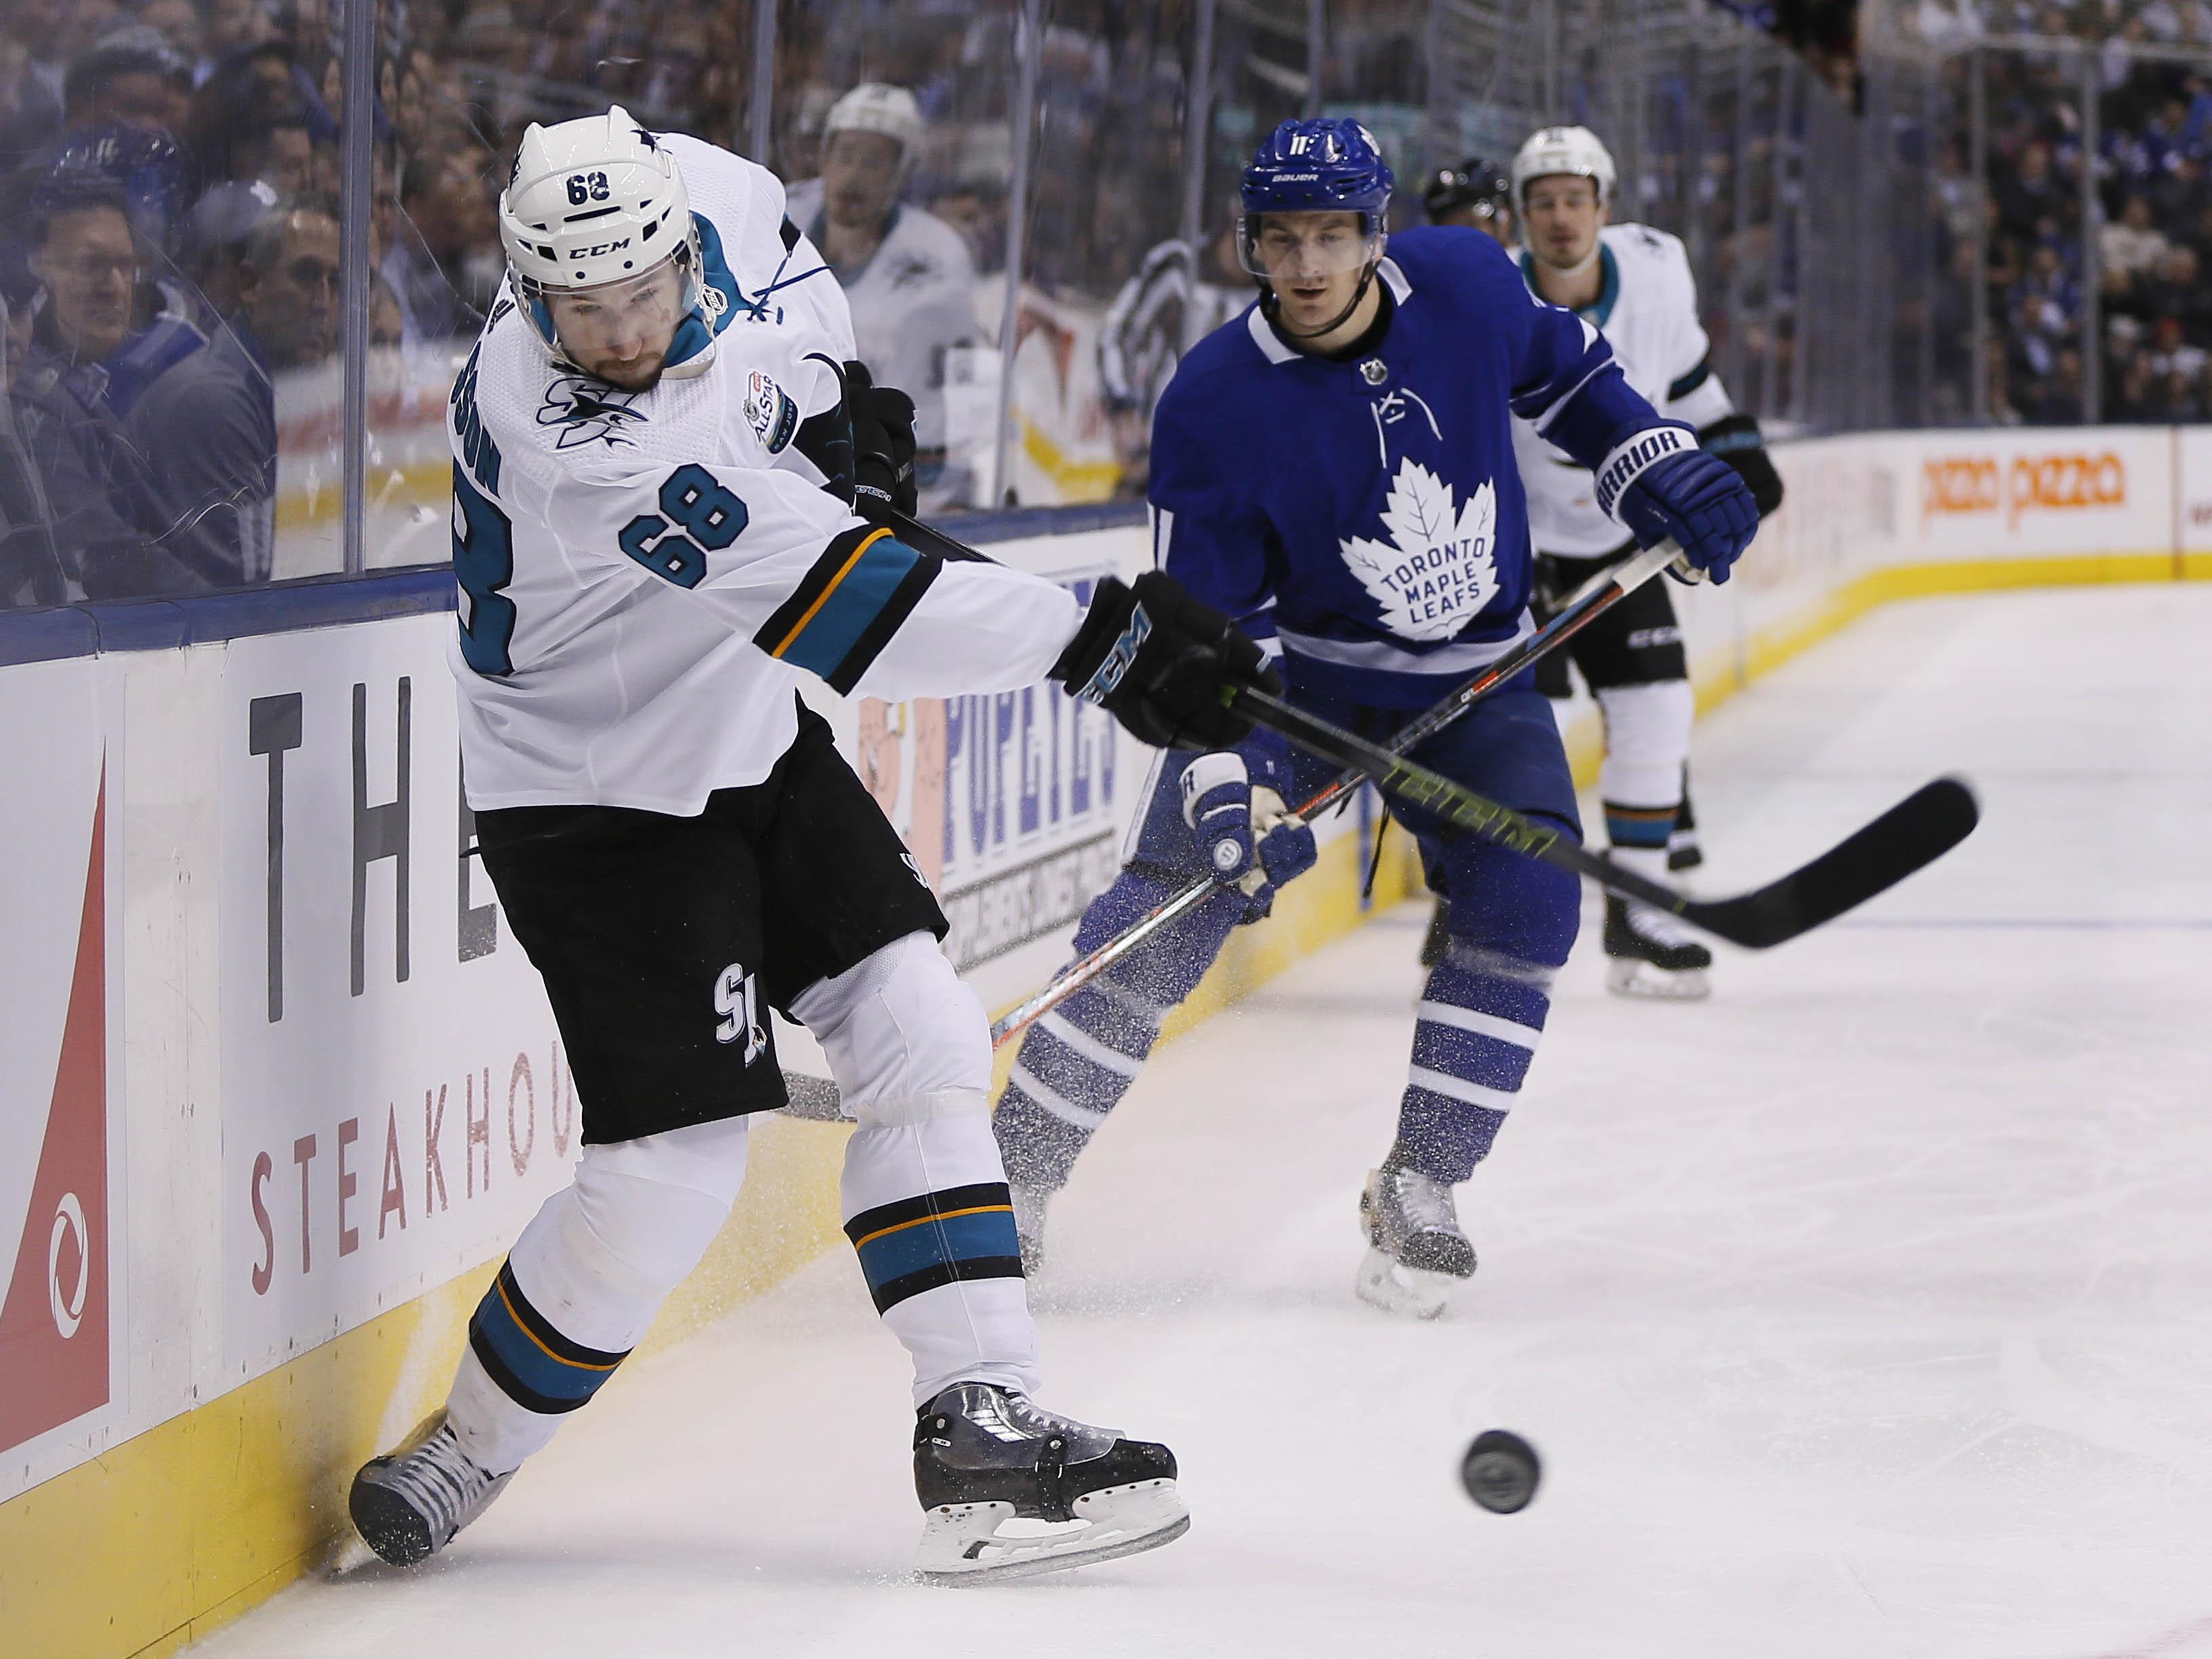 Nov 28, 2018; Toronto, Ontario, CAN; San Jose Sharks forward Melker Karlsson (68) shoots the puck as Toronto Maple Leafs forward Zach Hyman (11) looks on at Scotiabank Arena. Toronto defeated San Jose. Mandatory Credit: John E. Sokolowski